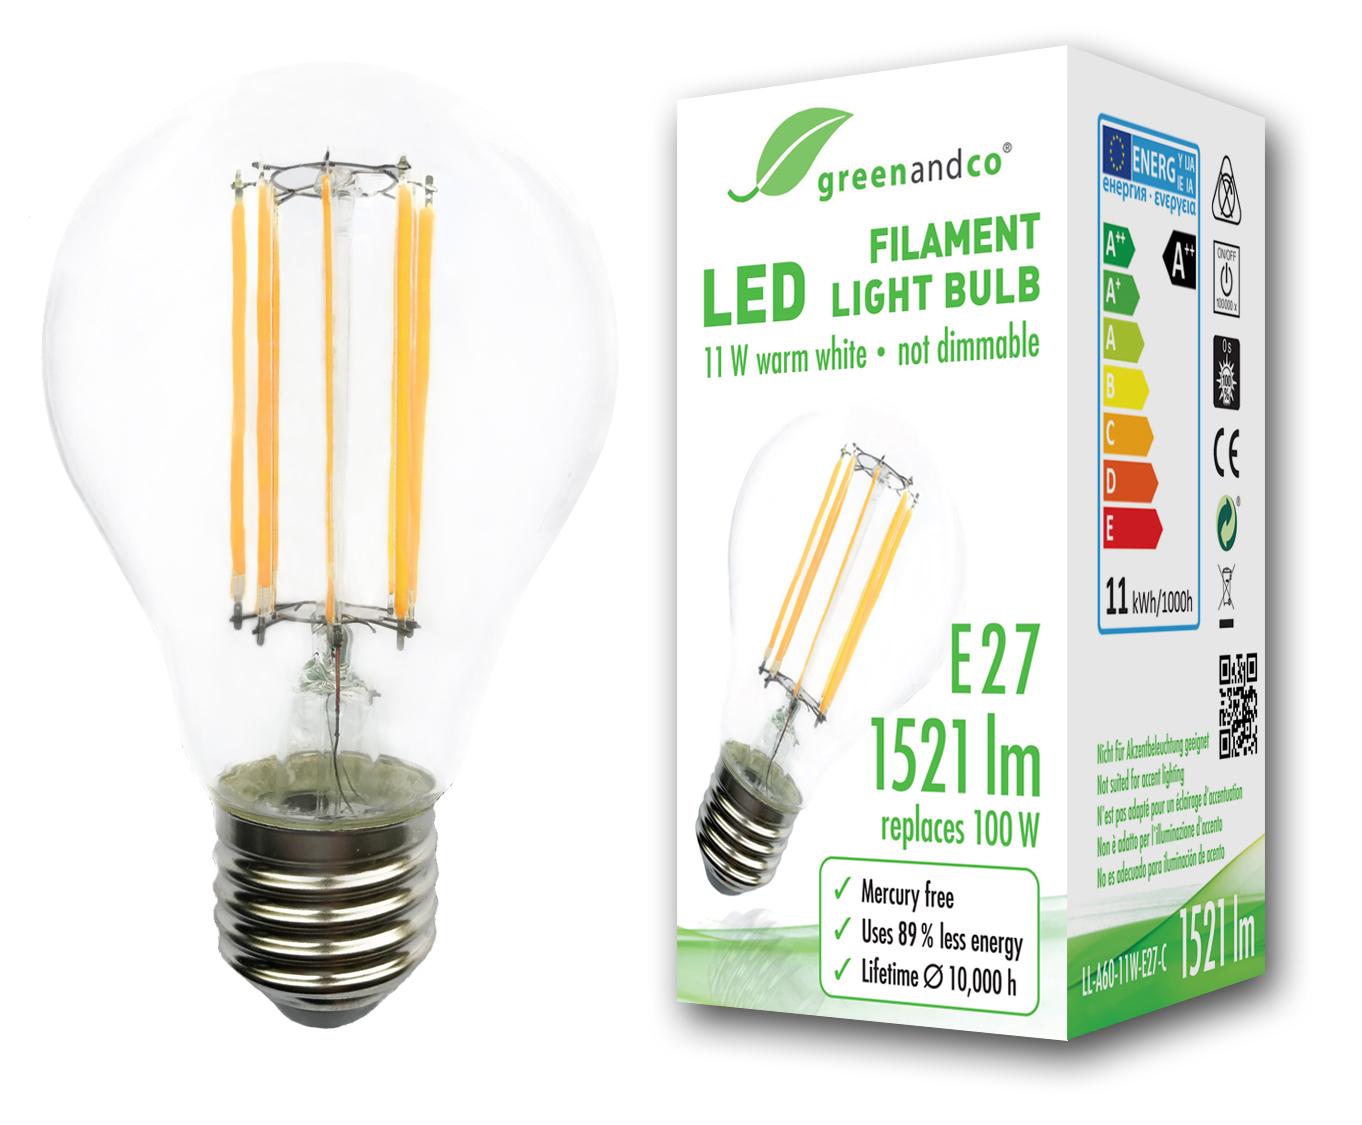 Glühfaden LED Lampe ersetzt 100W E27 11W 1521lm 2700K warmweiß 360 ...